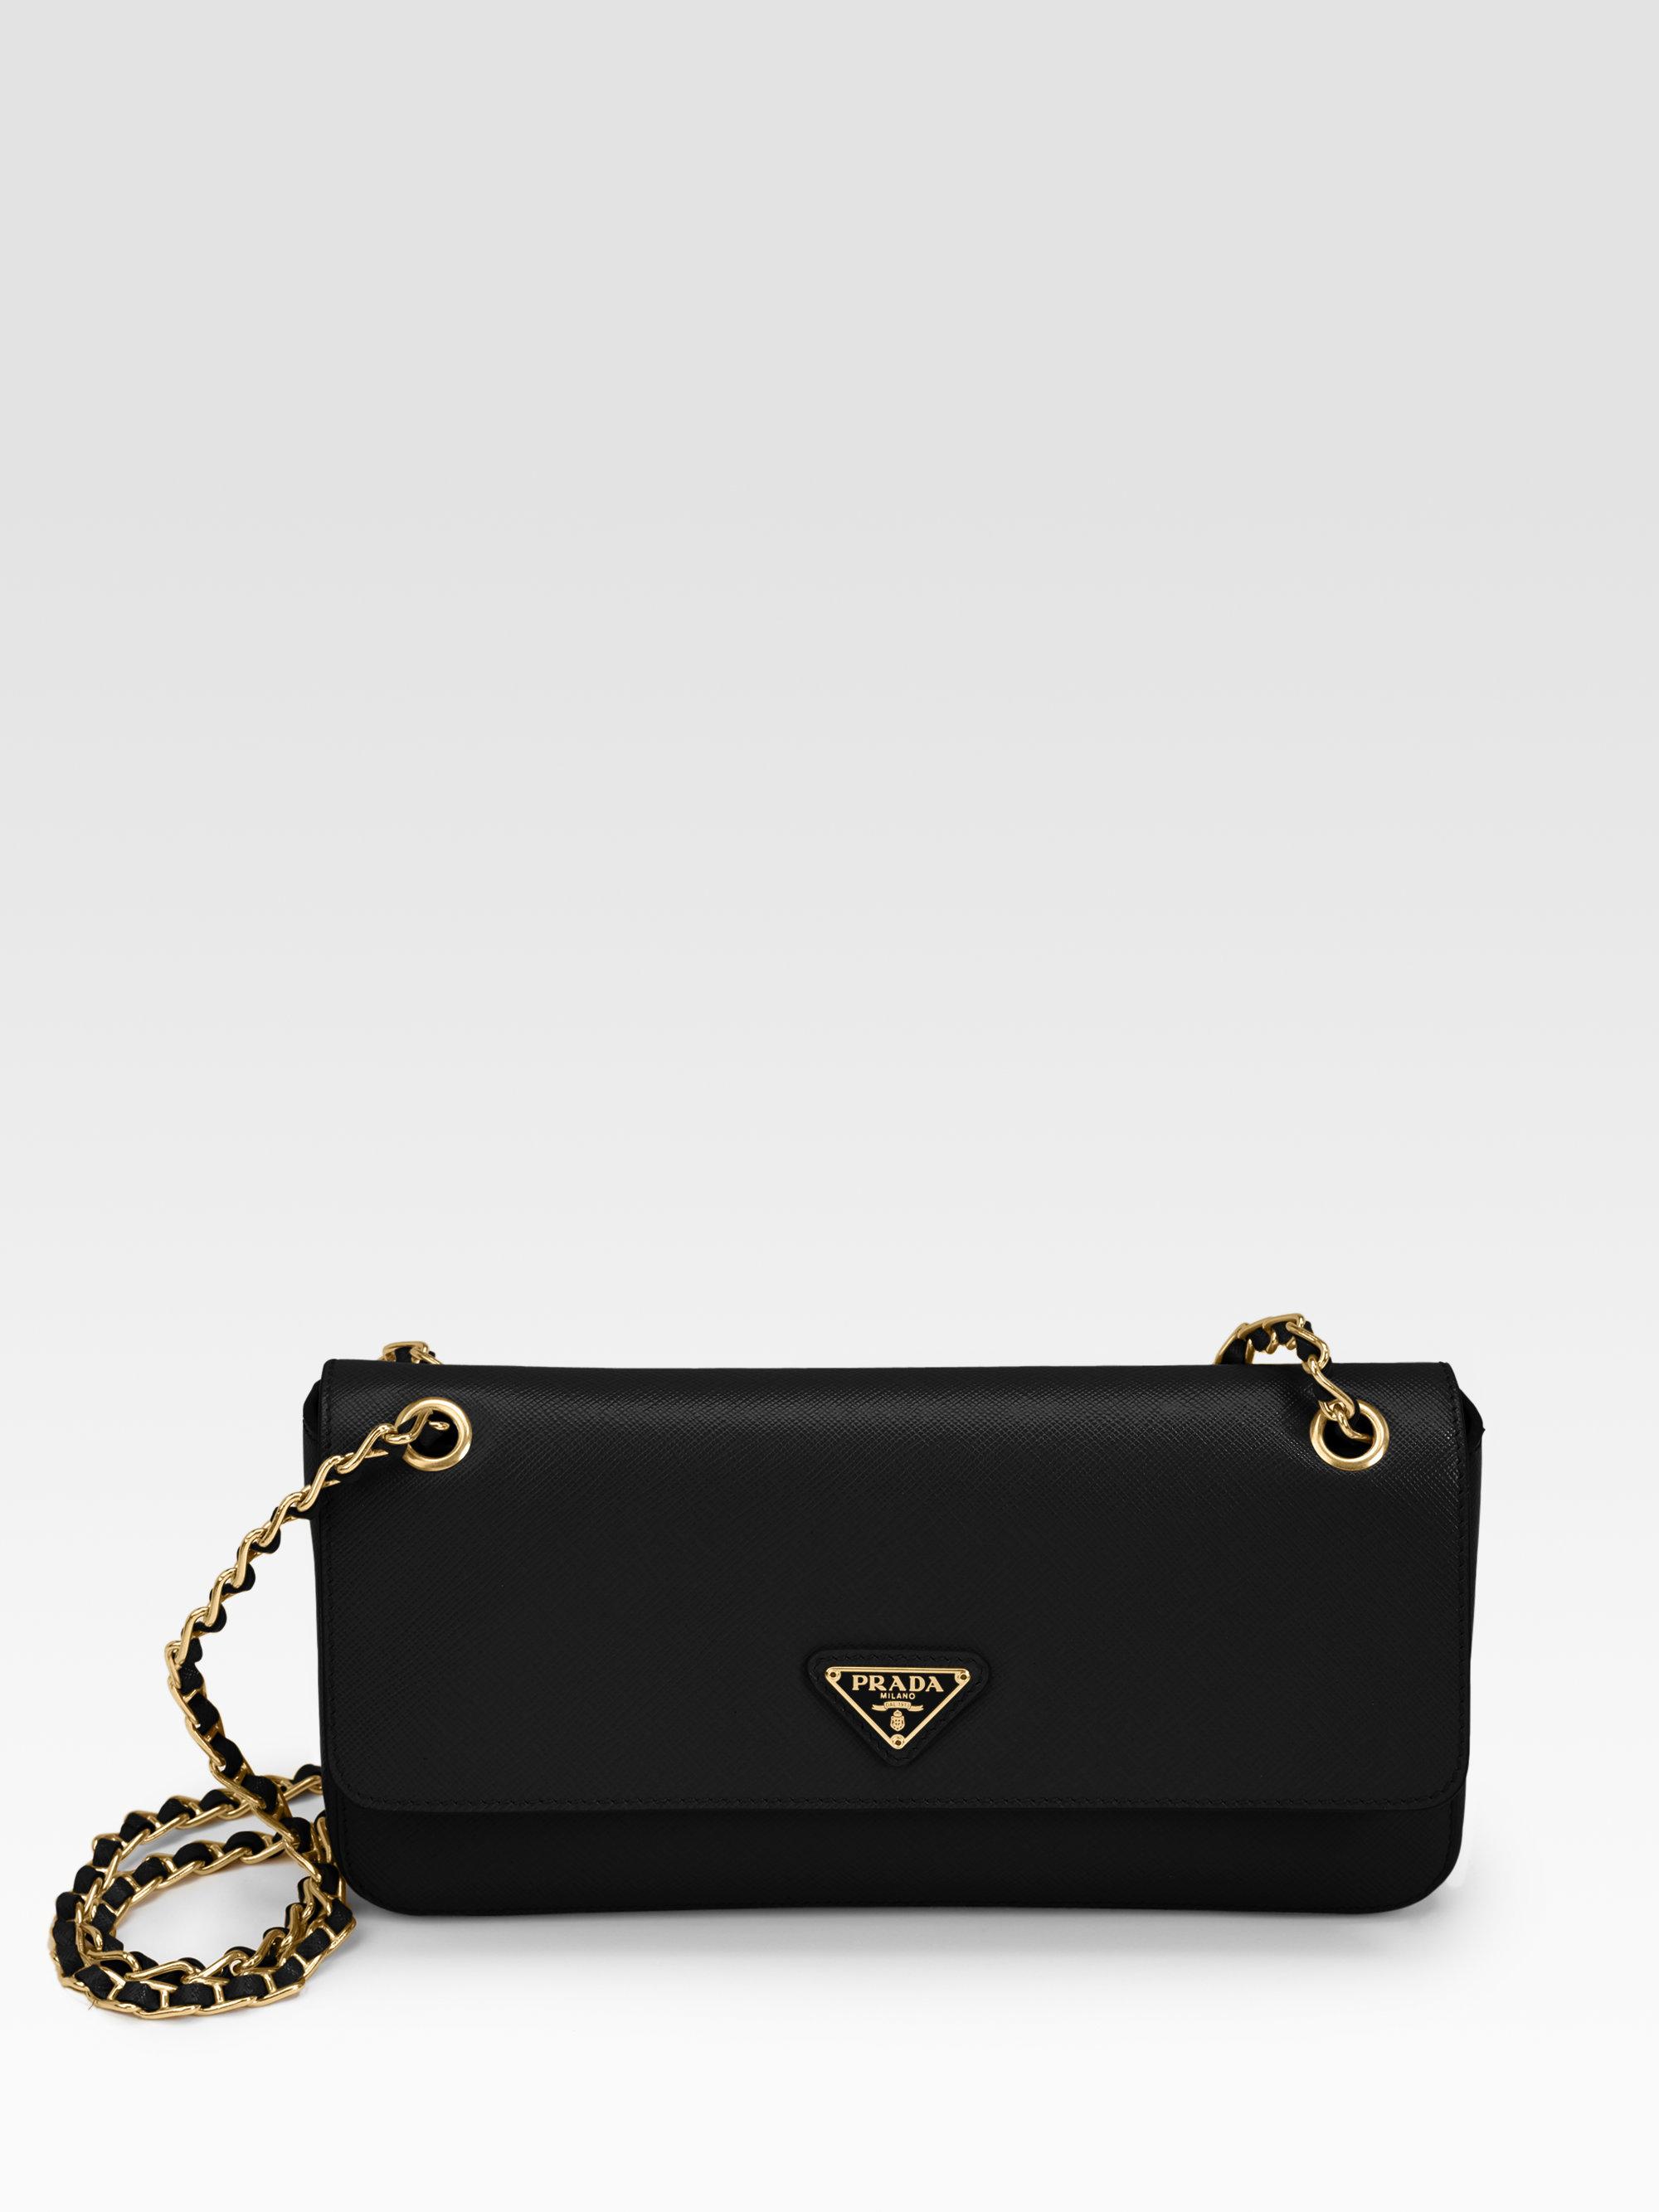 prad bags - prada black saffiano leather small box bag